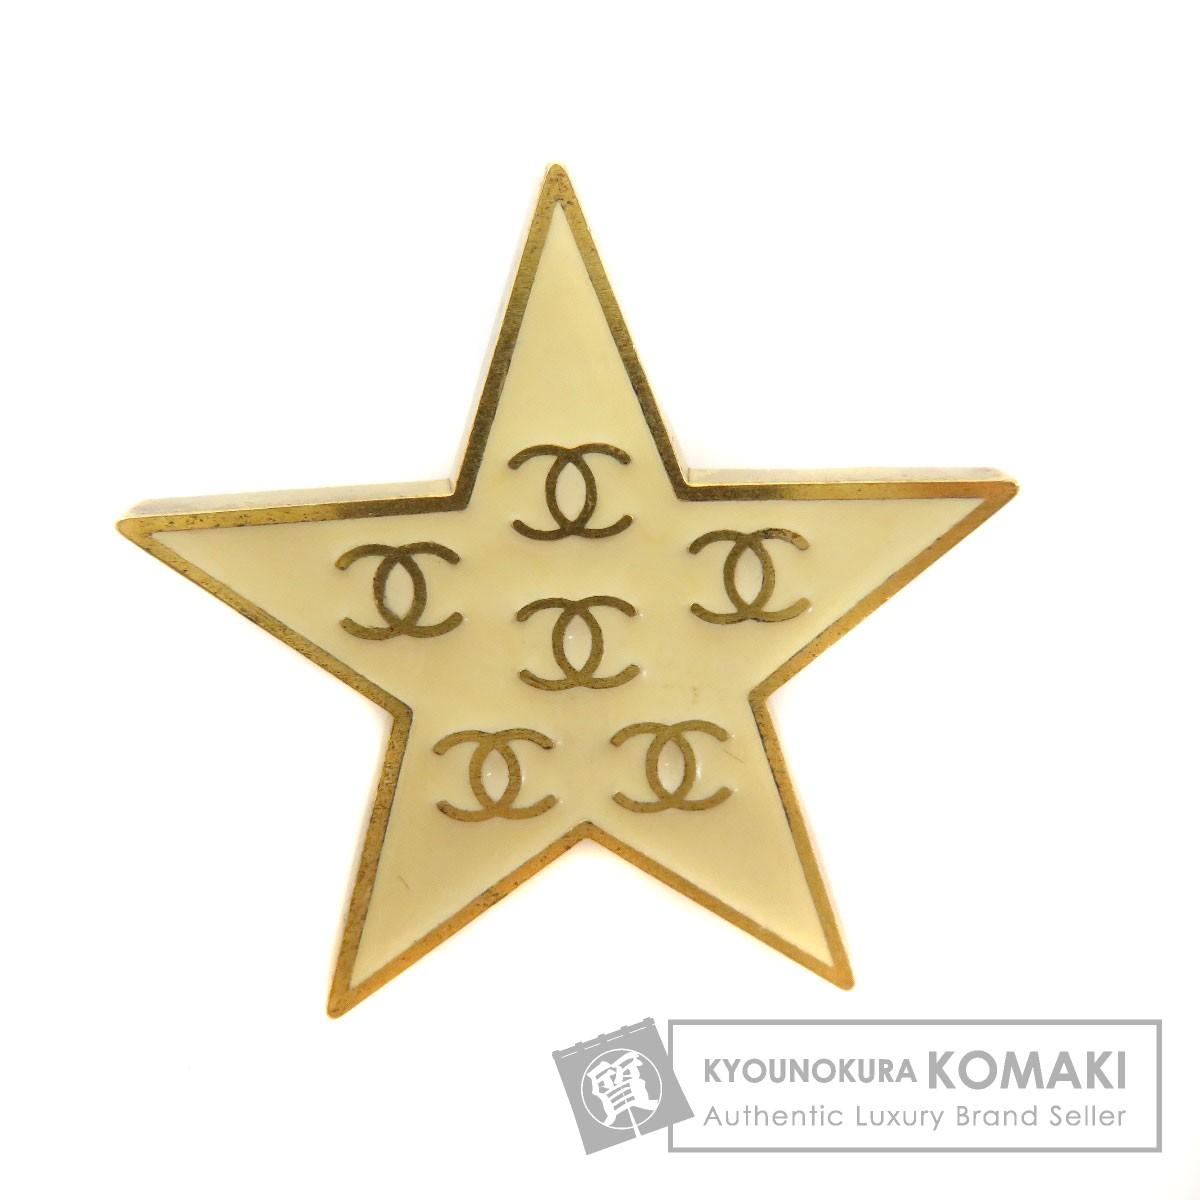 CHANEL スターモチーフ ココマーク ブローチ 金属製 レディース 【中古】【シャネル】